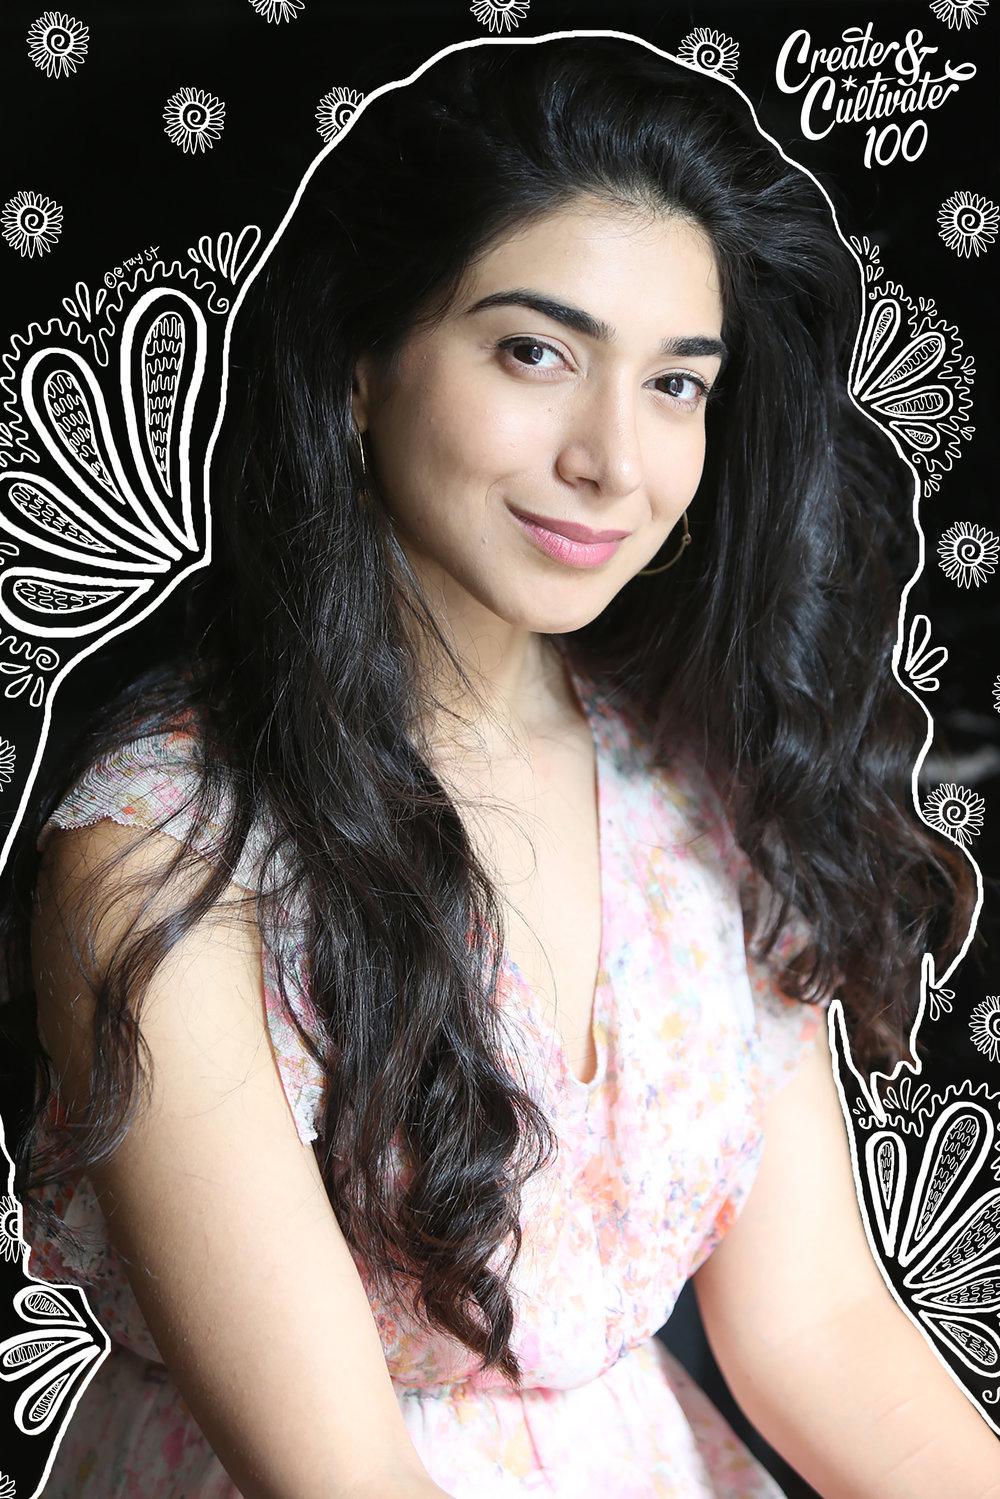 Shiza Shahid headshot.jpg